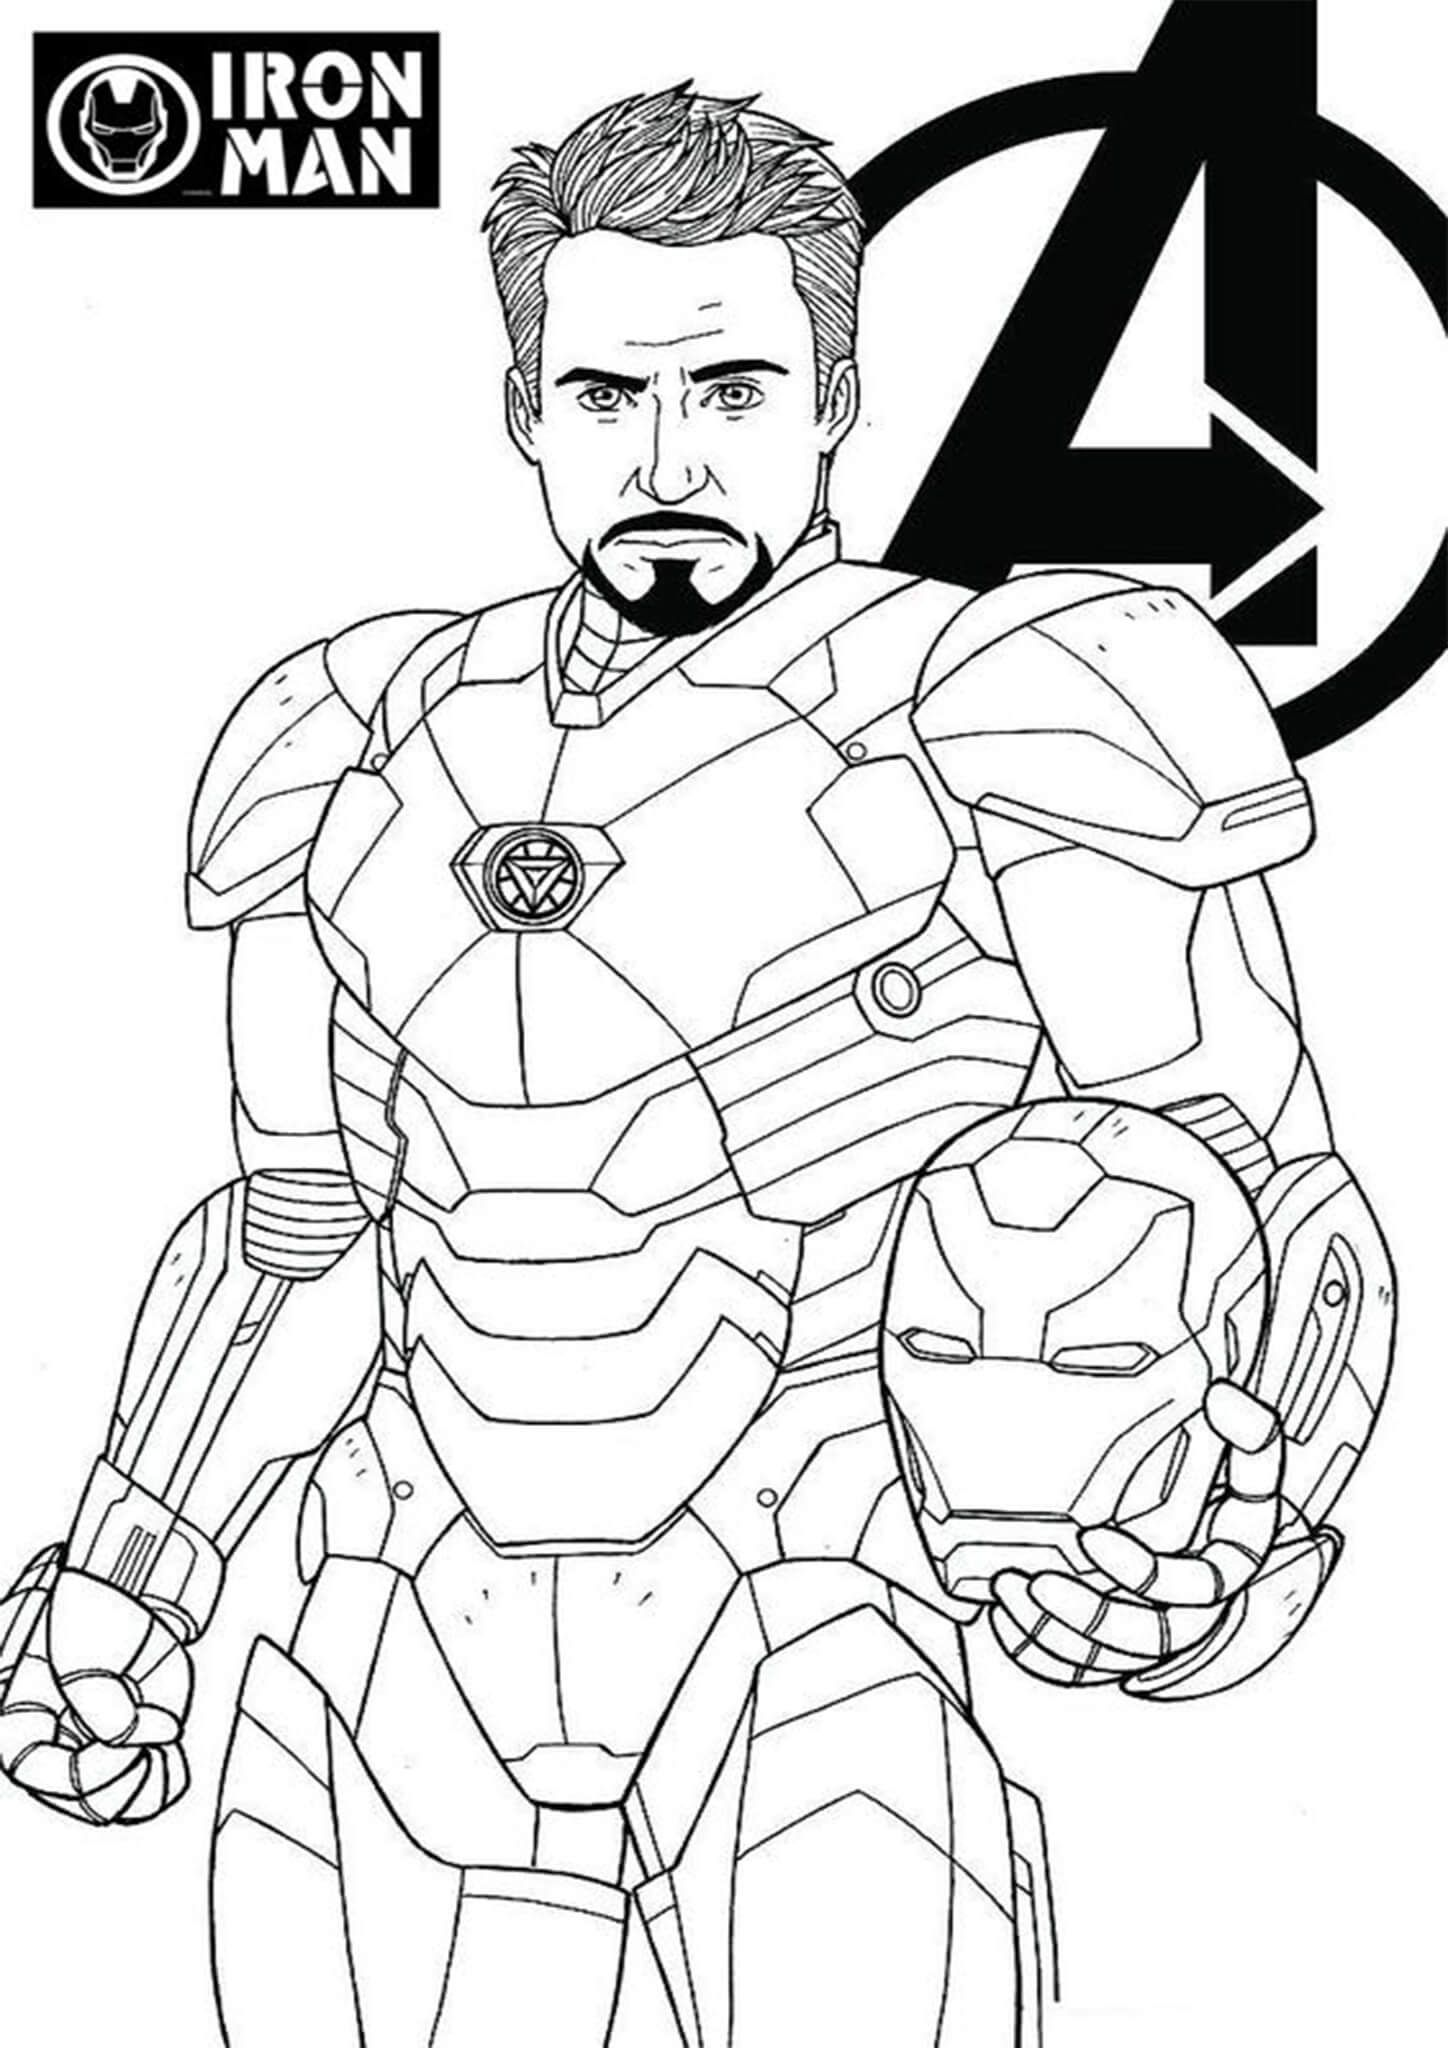 Free Easy To Print Iron Man Coloring Pages Superhelden Malvorlagen Wenn Du Mal Buch Iron Man Cartoon